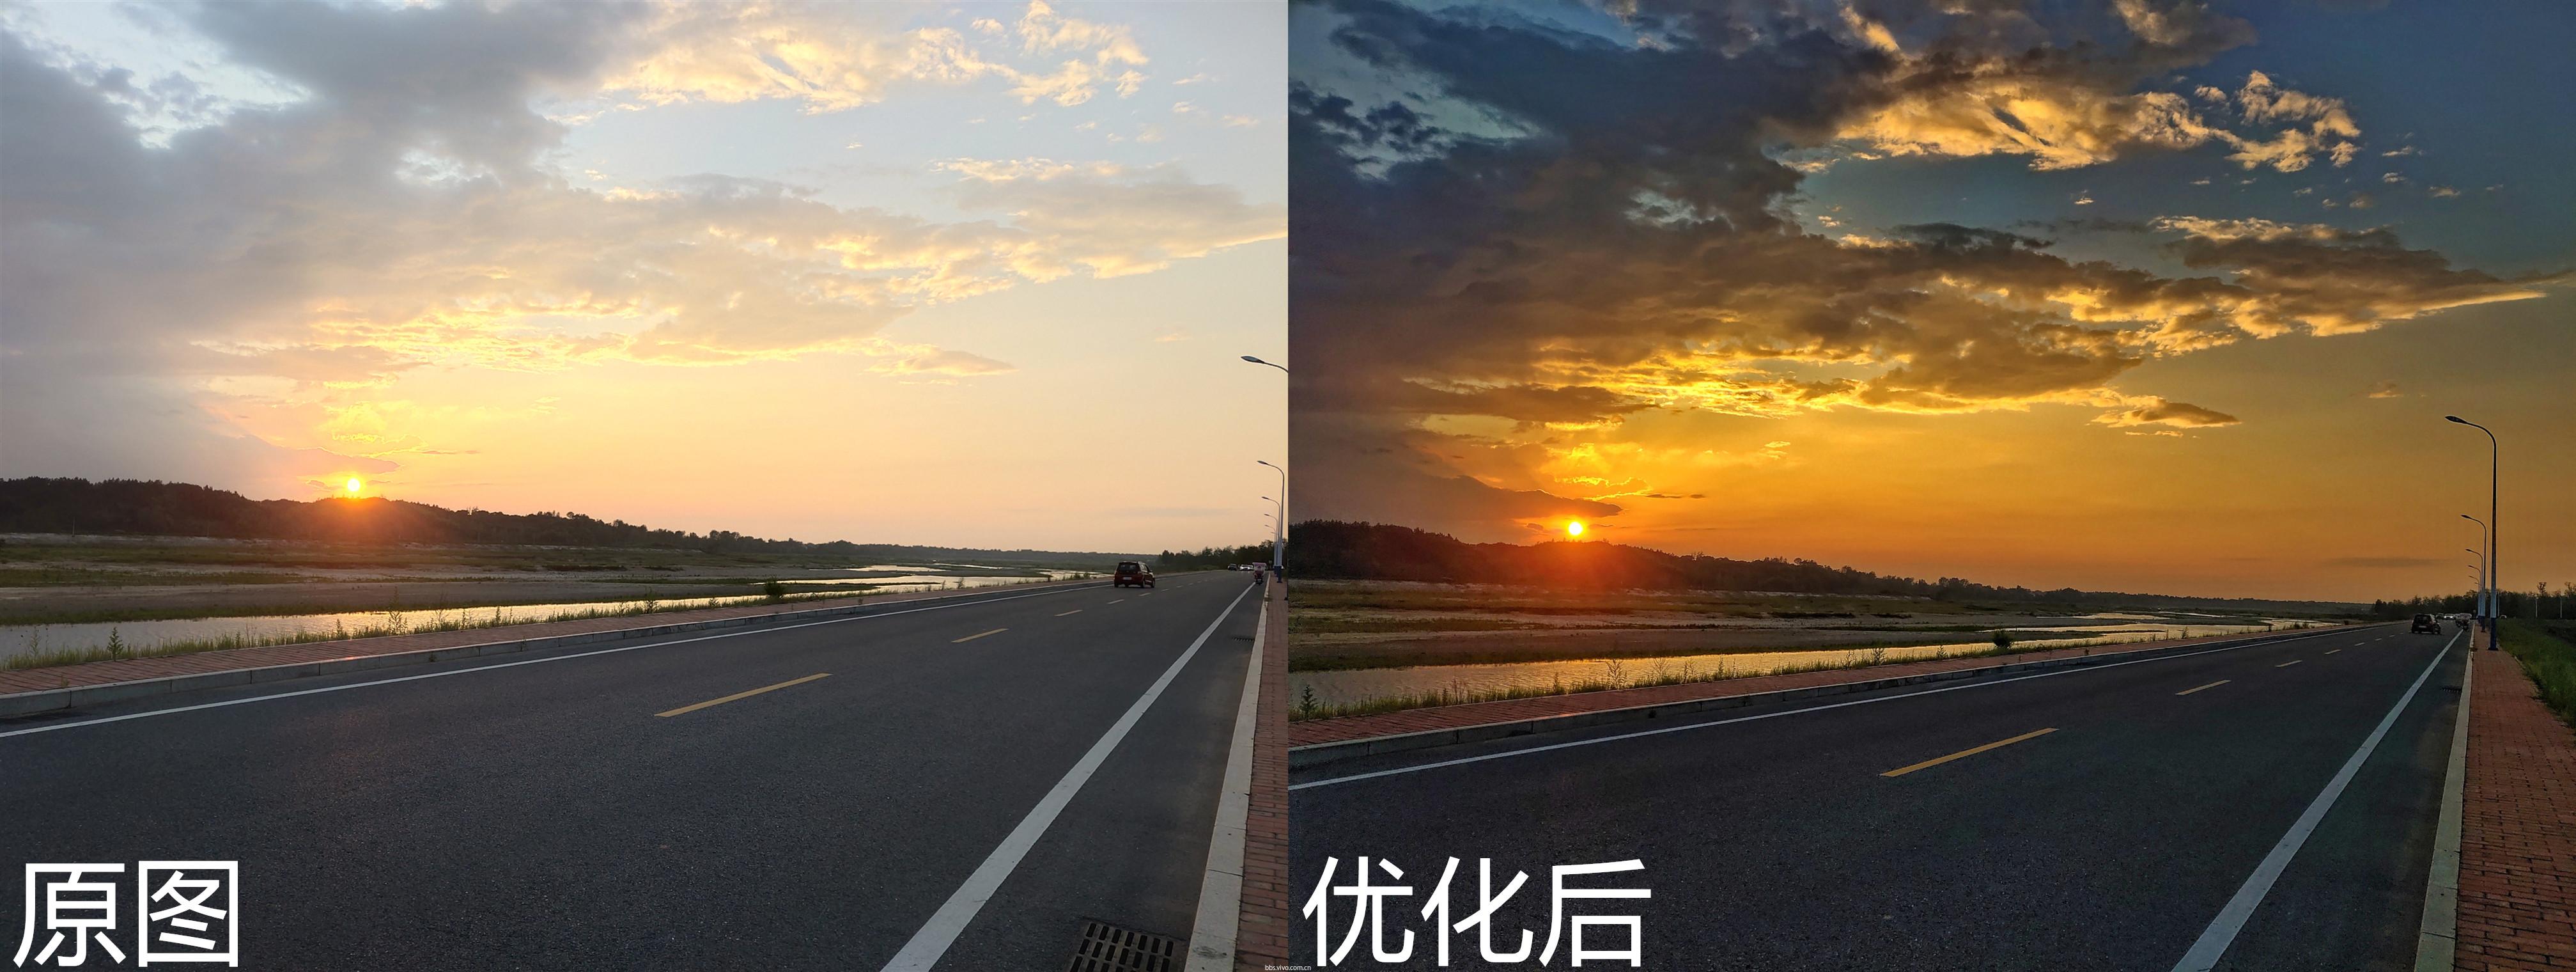 IMG_20190811_184600_副本_副本.jpg